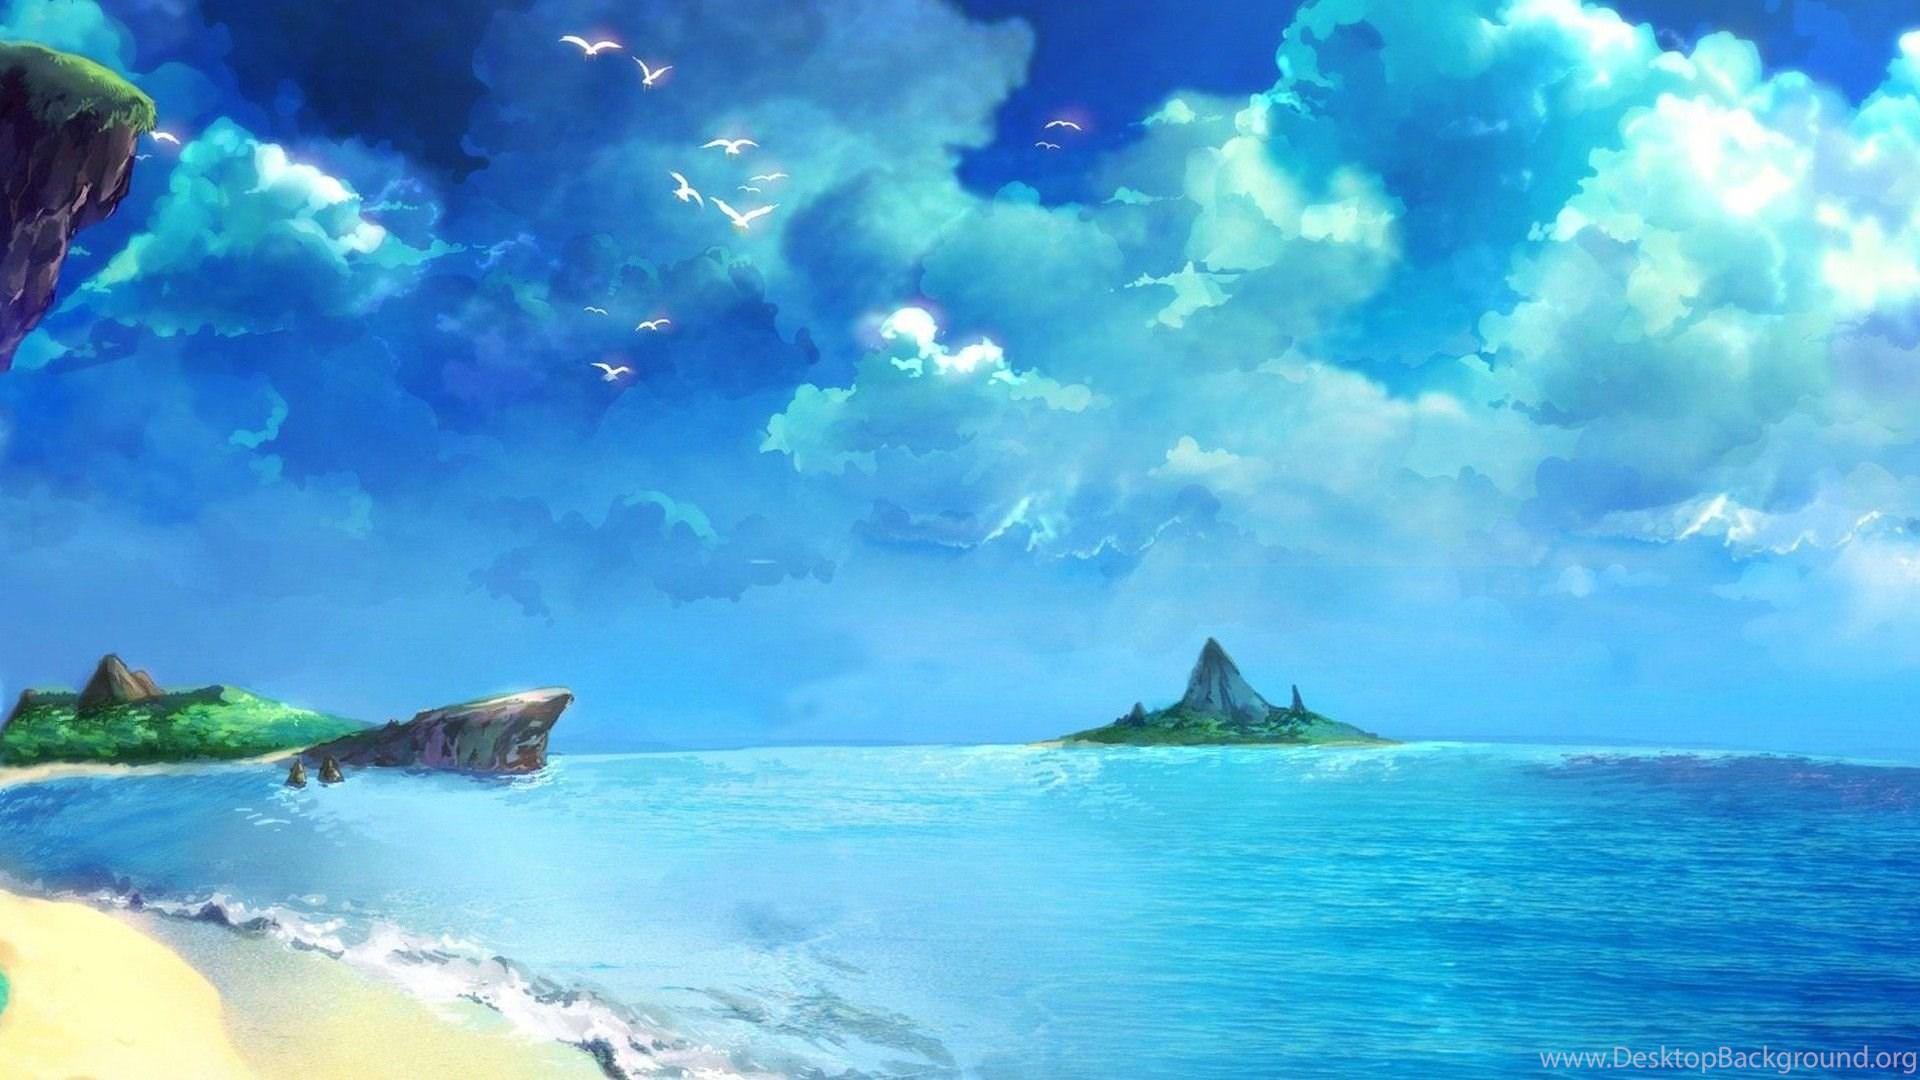 gallery for anime ocean backgrounds desktop background